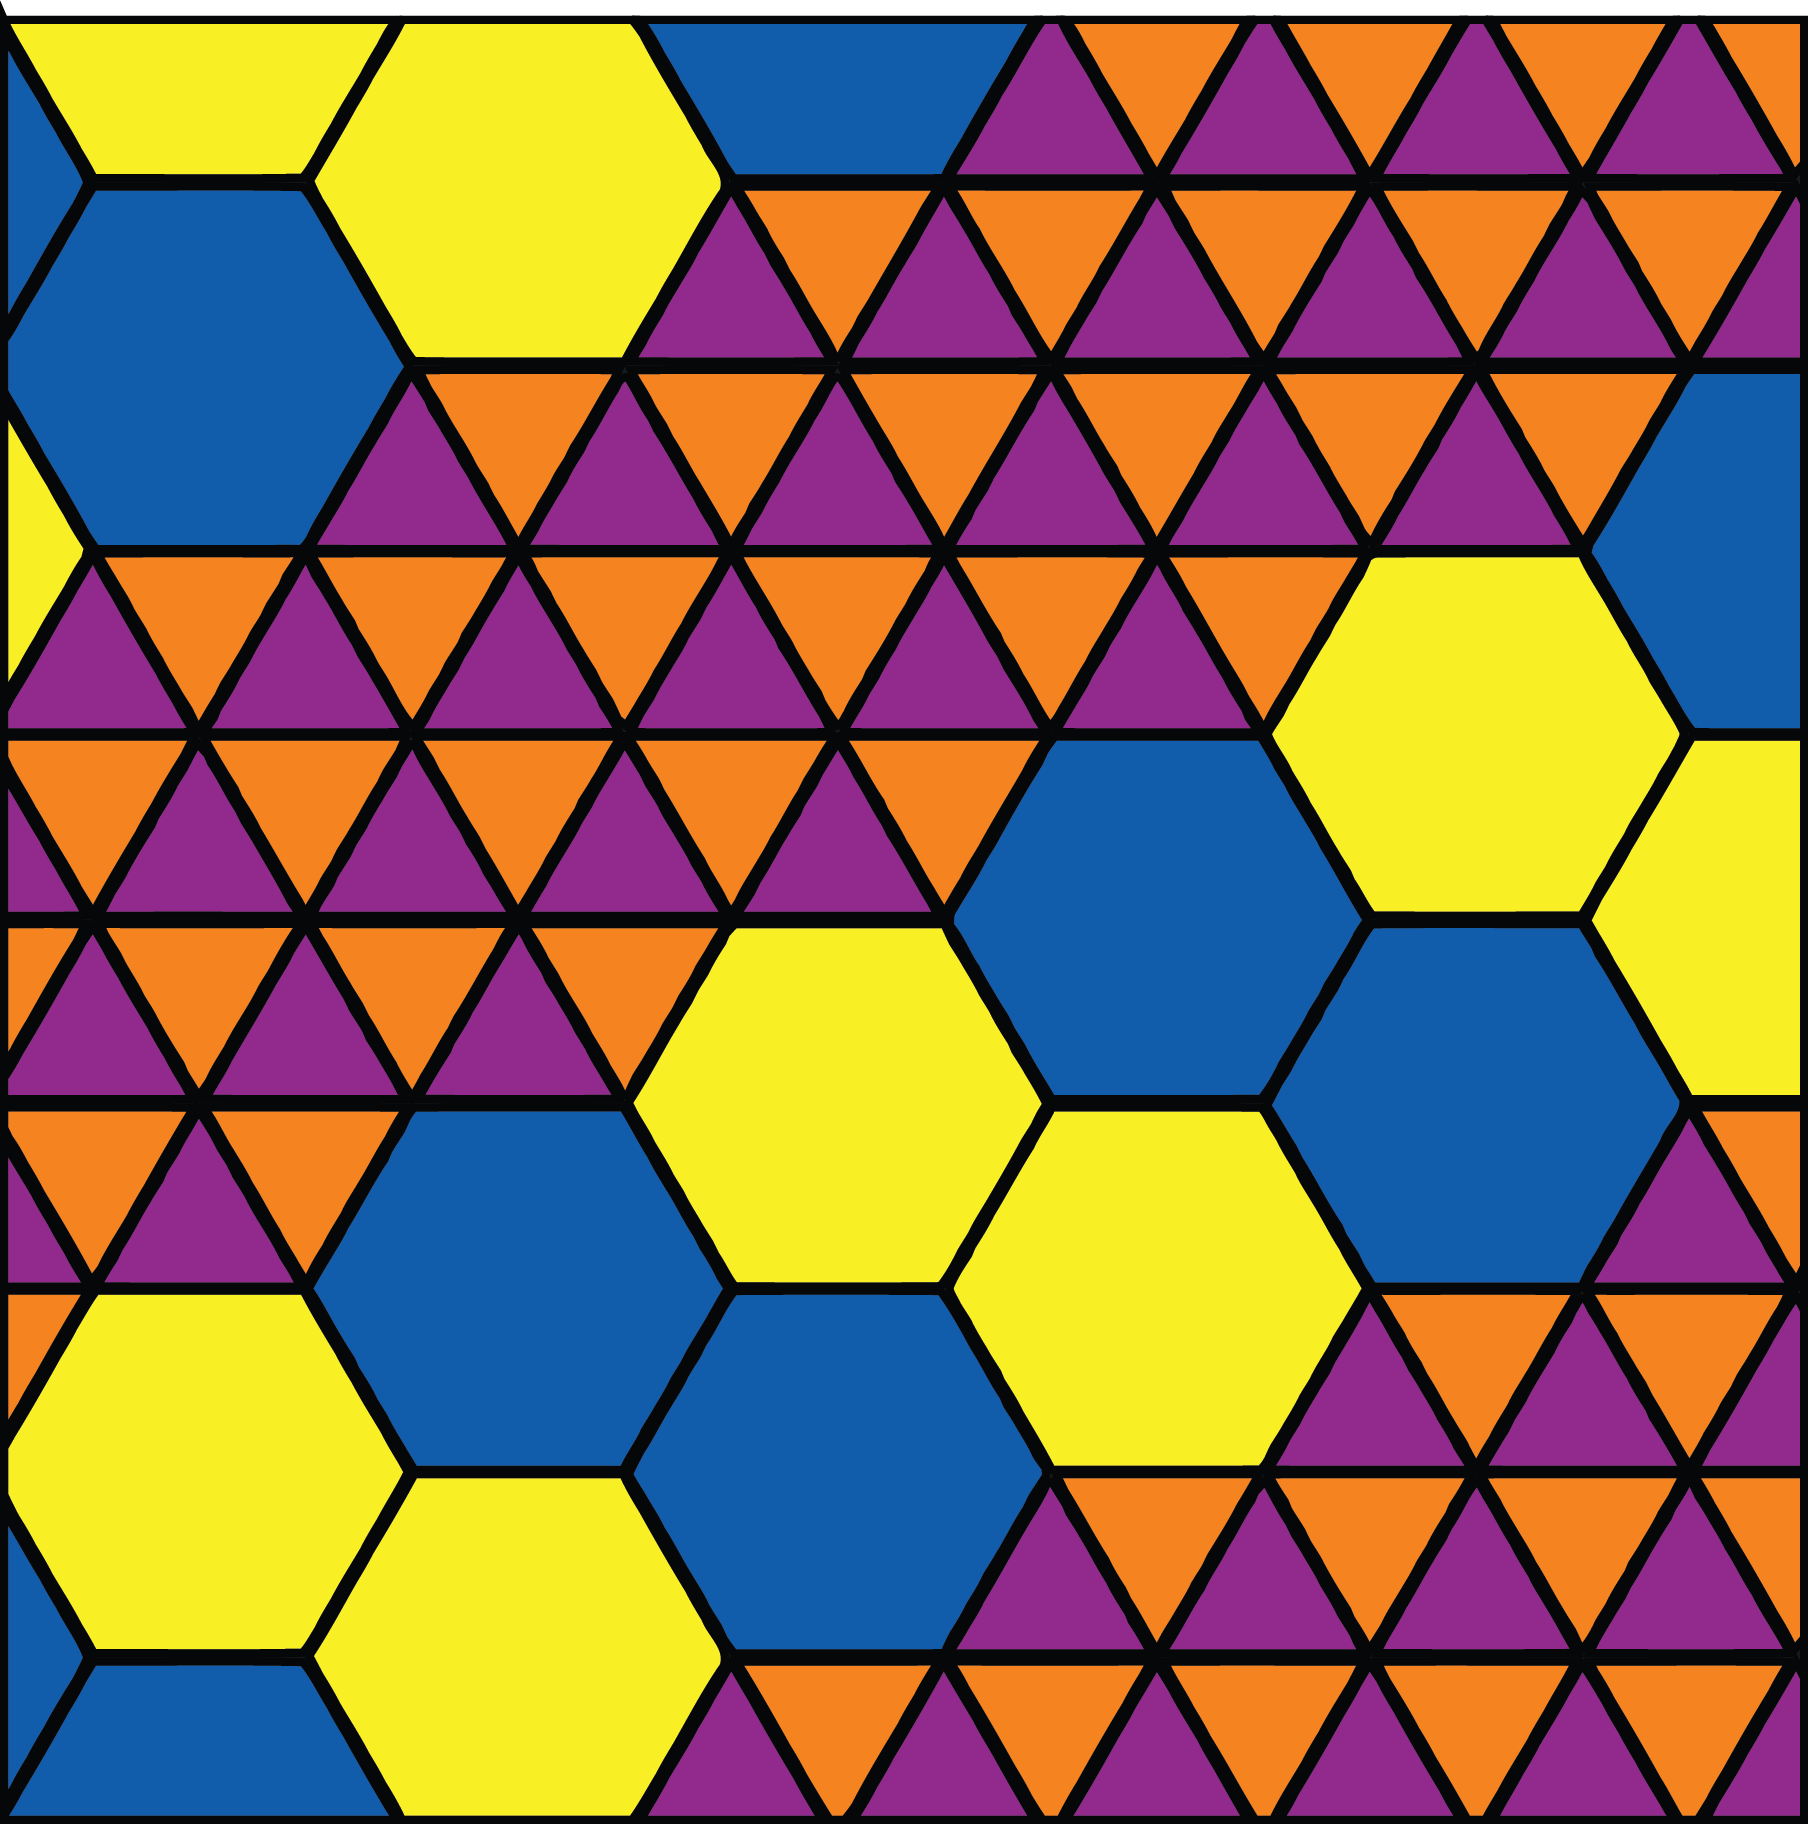 Symmetry Works